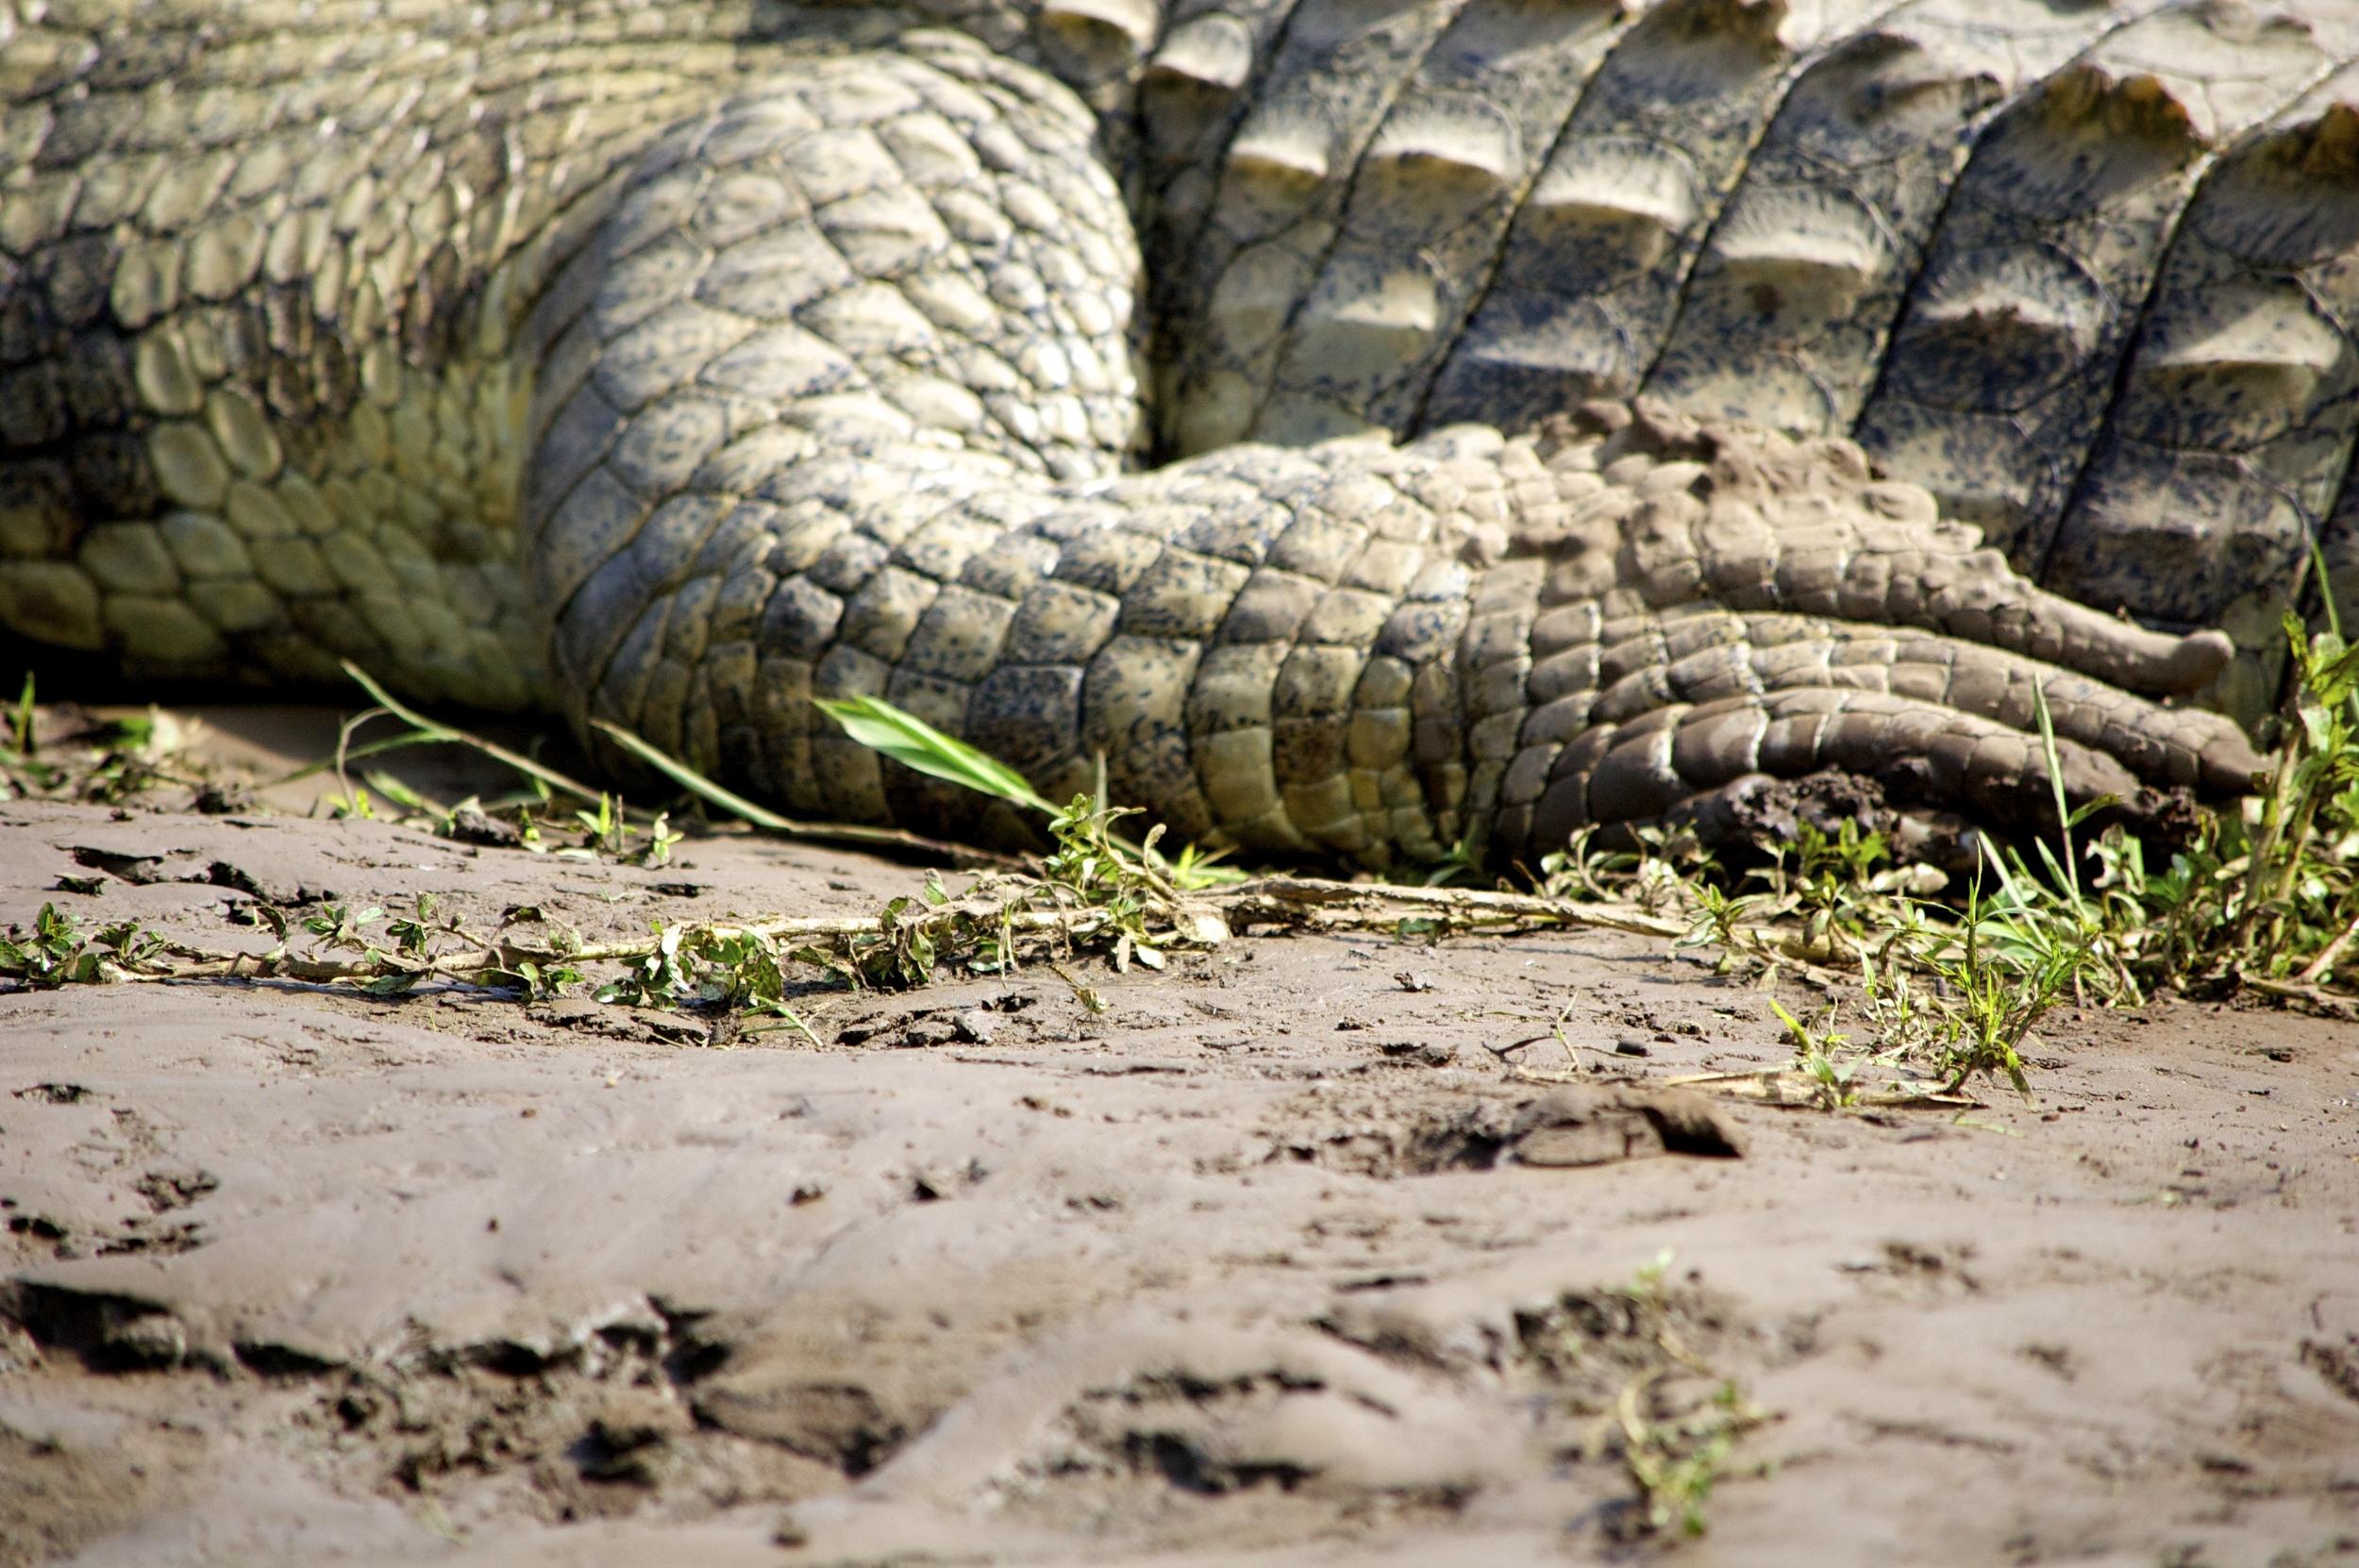 Crocodile claws